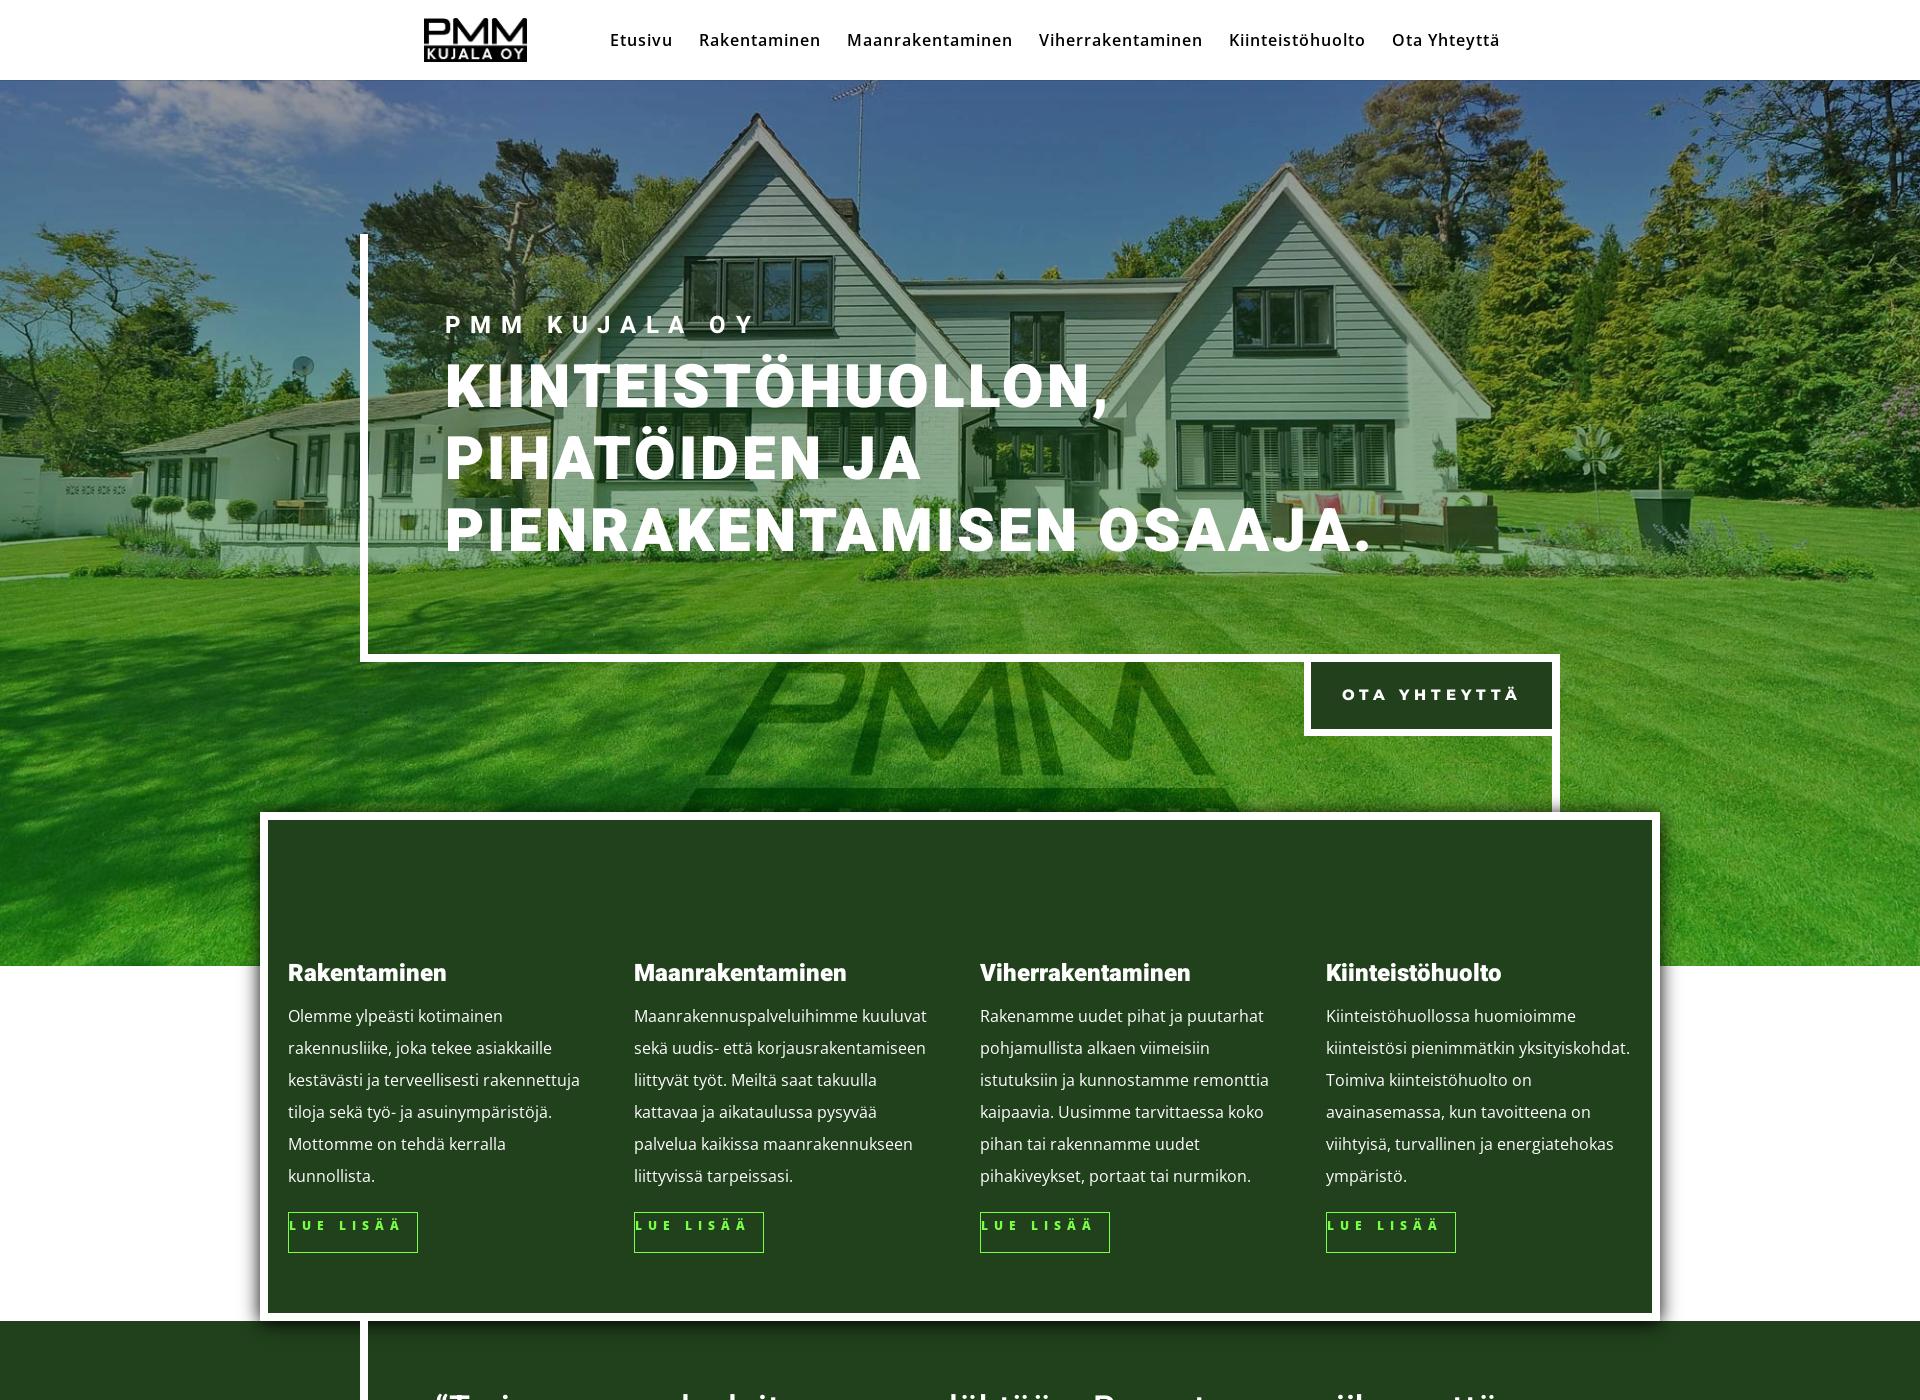 Screenshot for pmm-kujala.fi